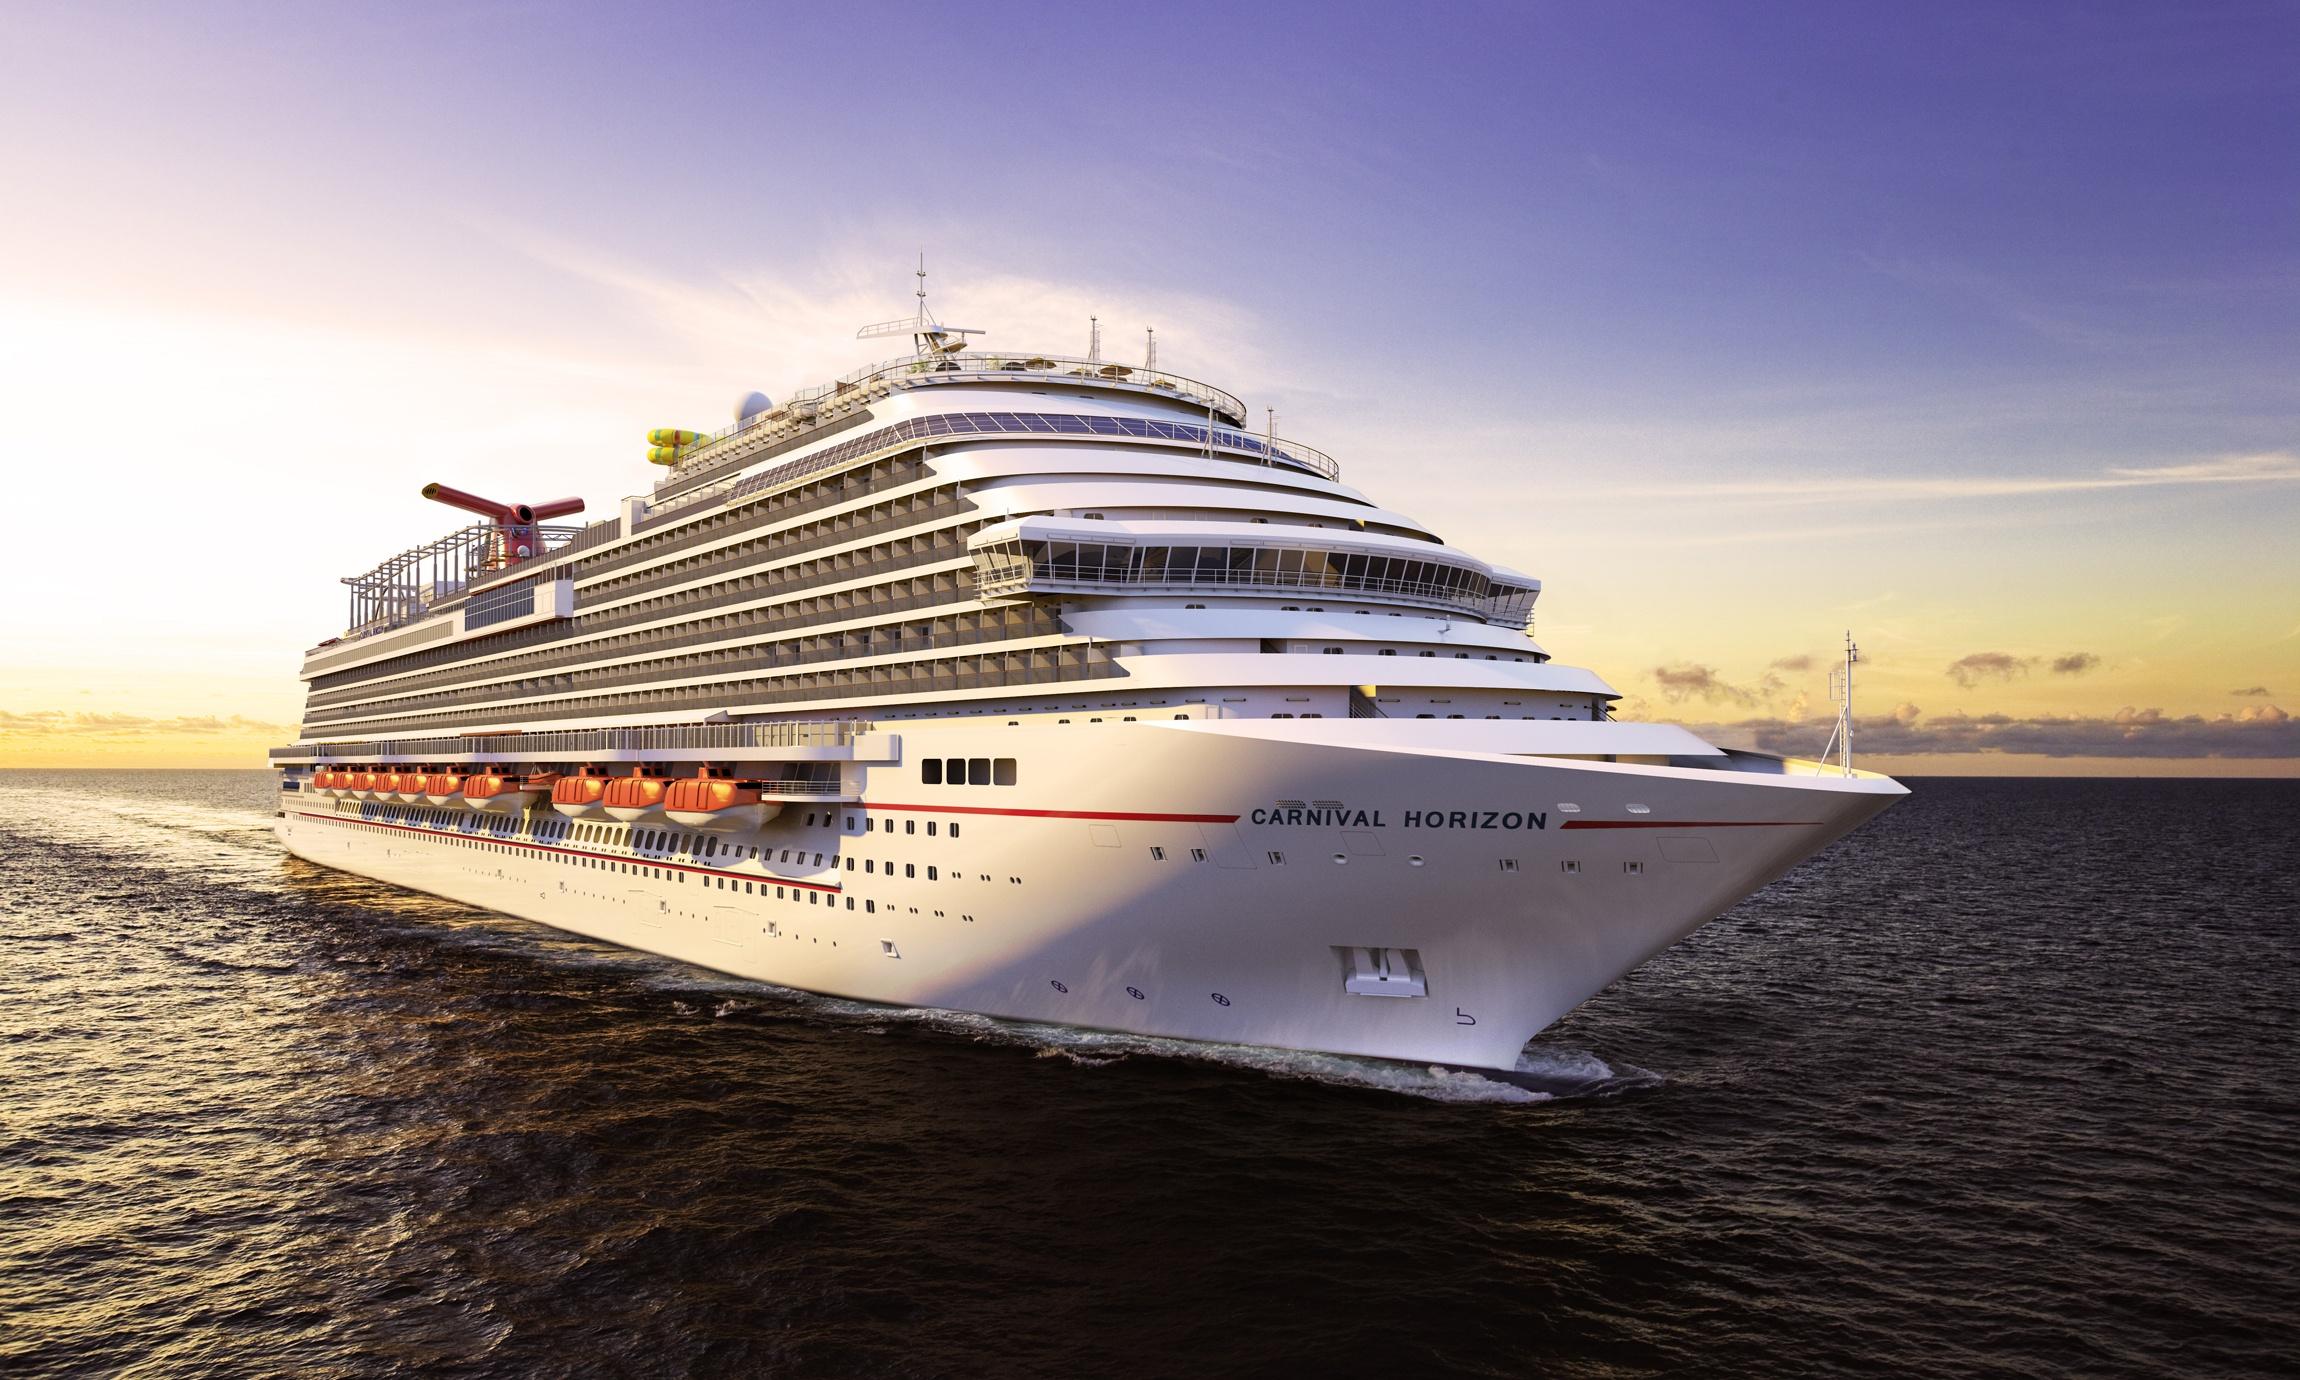 MS Carnival Horizon Carnival Cruise Line